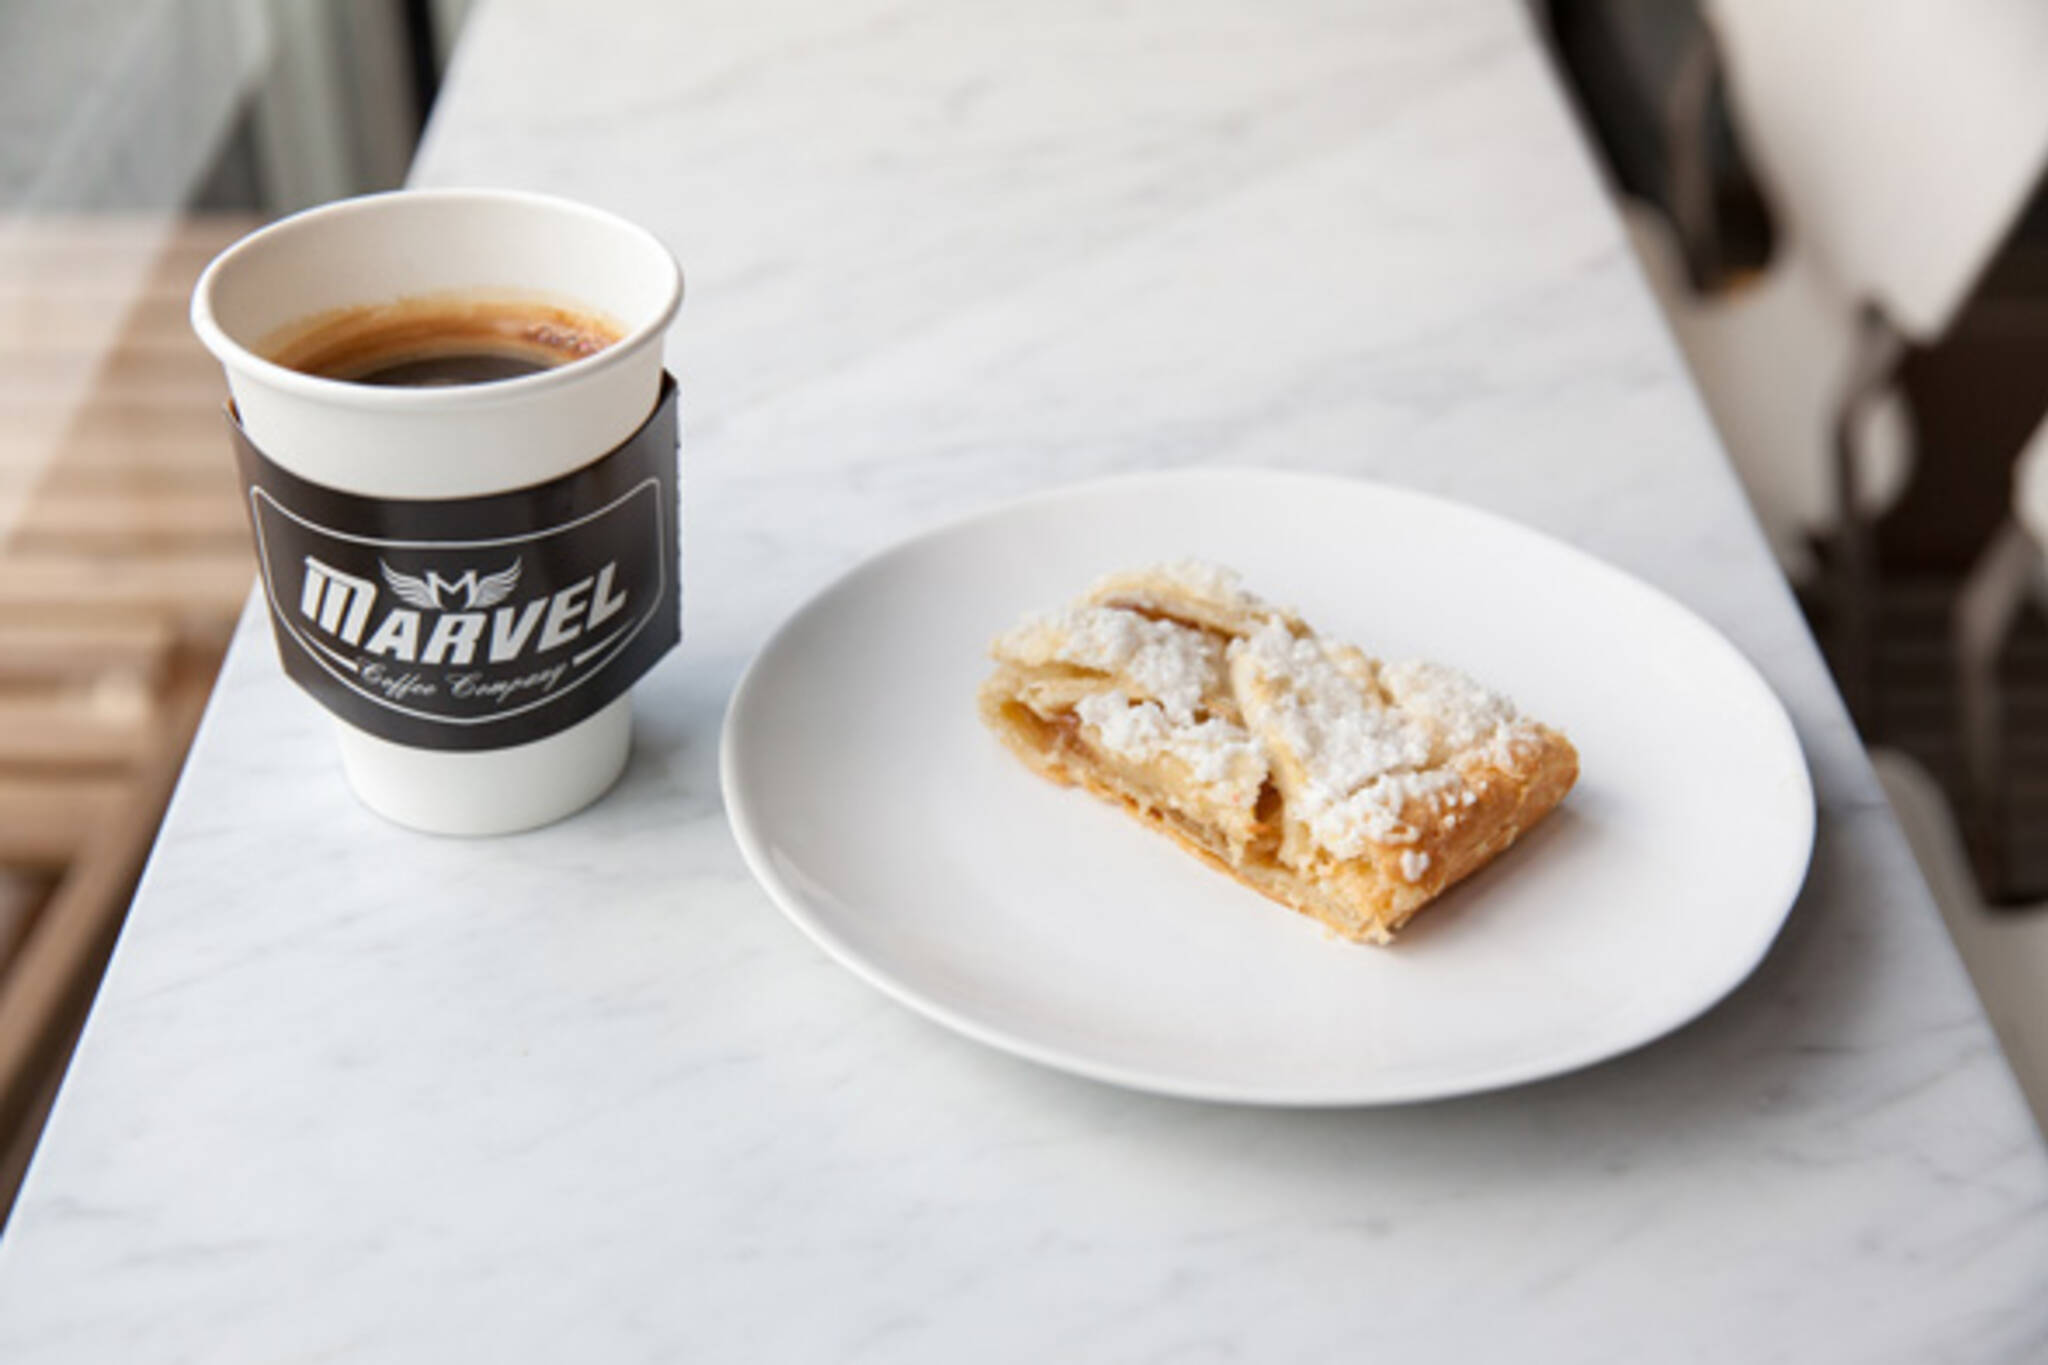 marvel coffee toronto